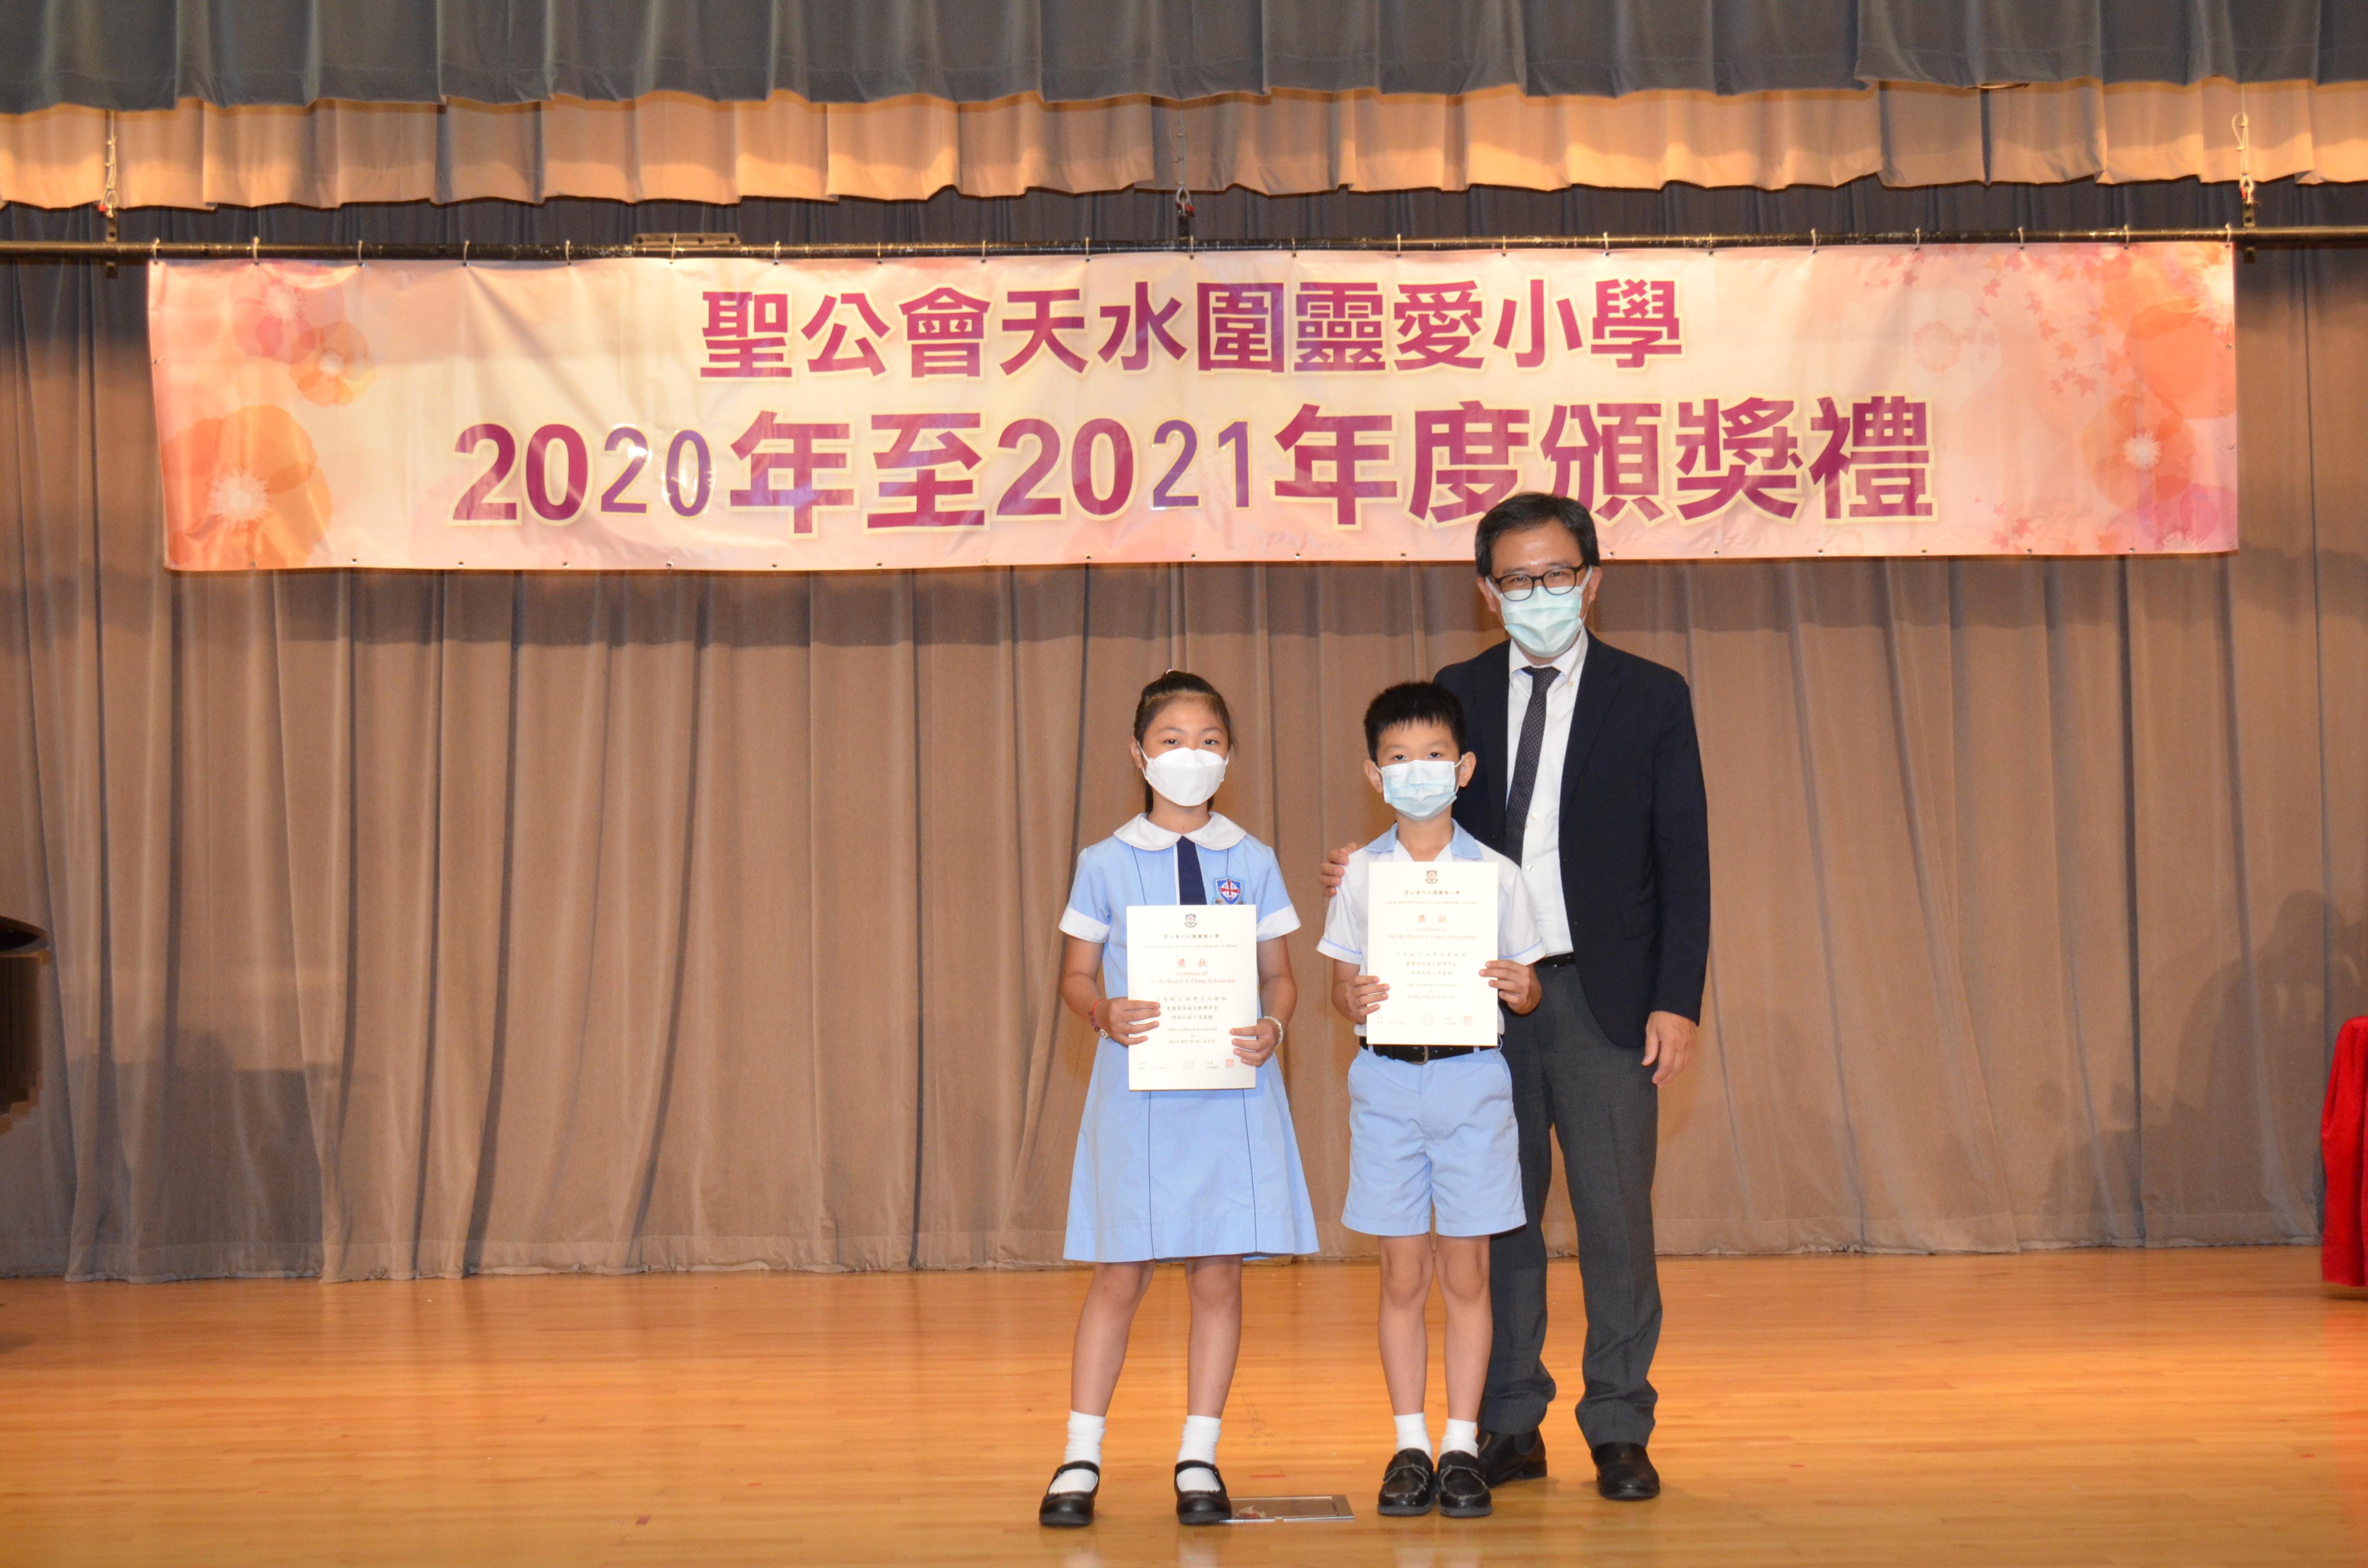 https://skhtswlo.edu.hk/sites/default/files/dsc_3489_1.jpg